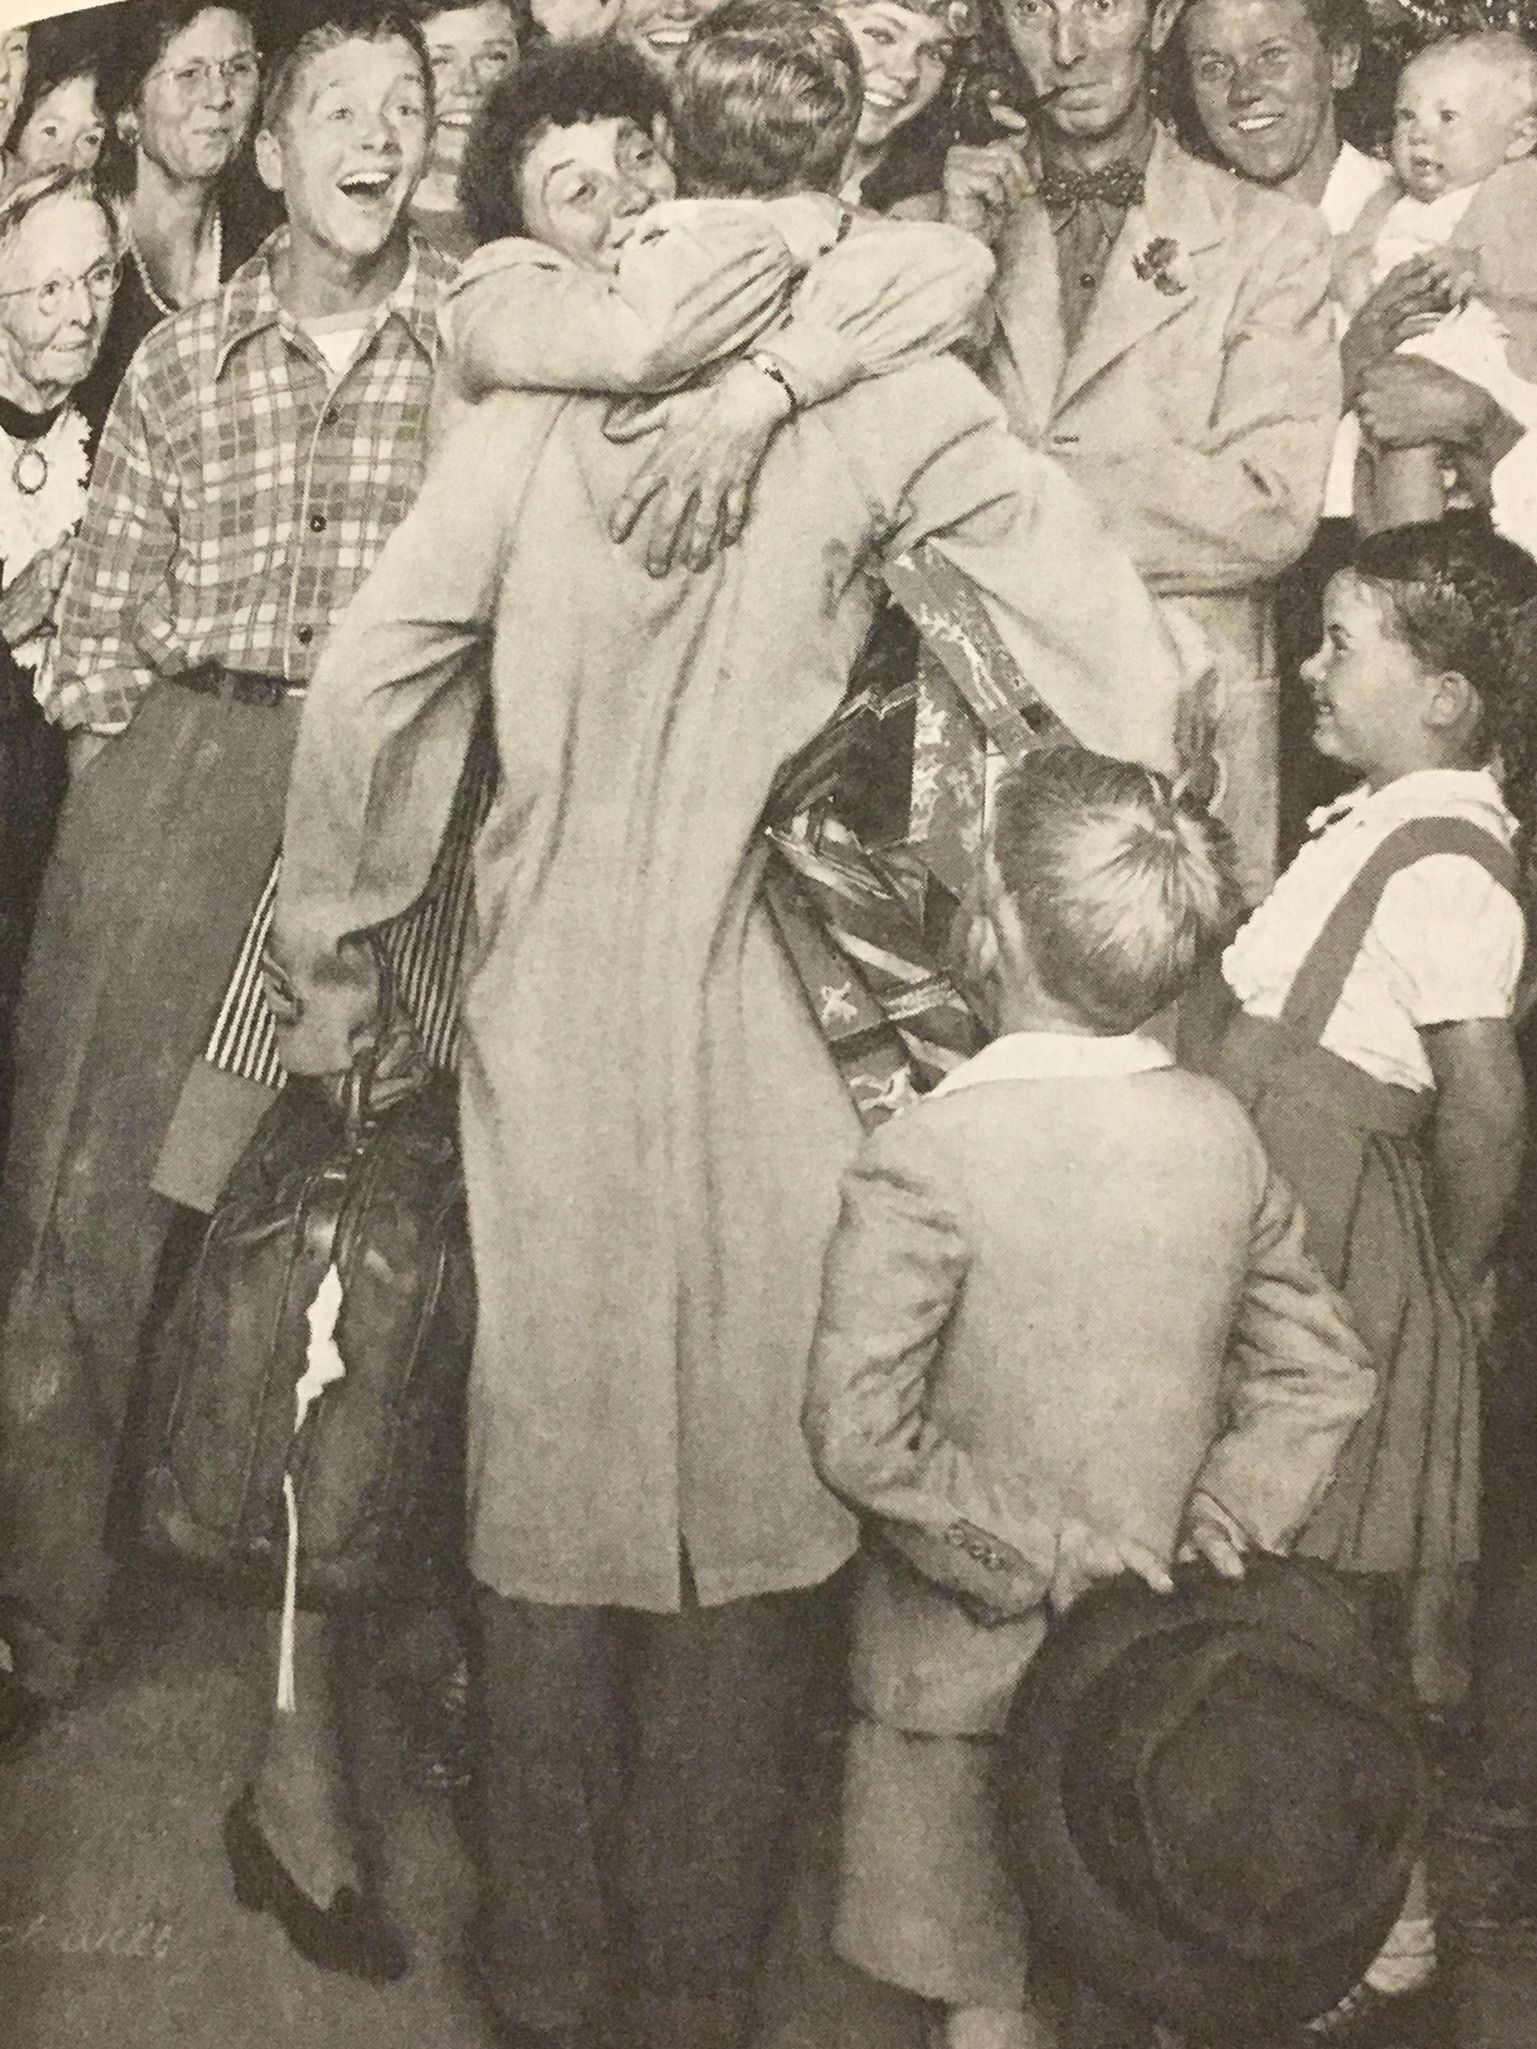 Christmas Homecoming Rockwell.Rockwell Norman Christmas Homecoming 1948 Norman Rockwell